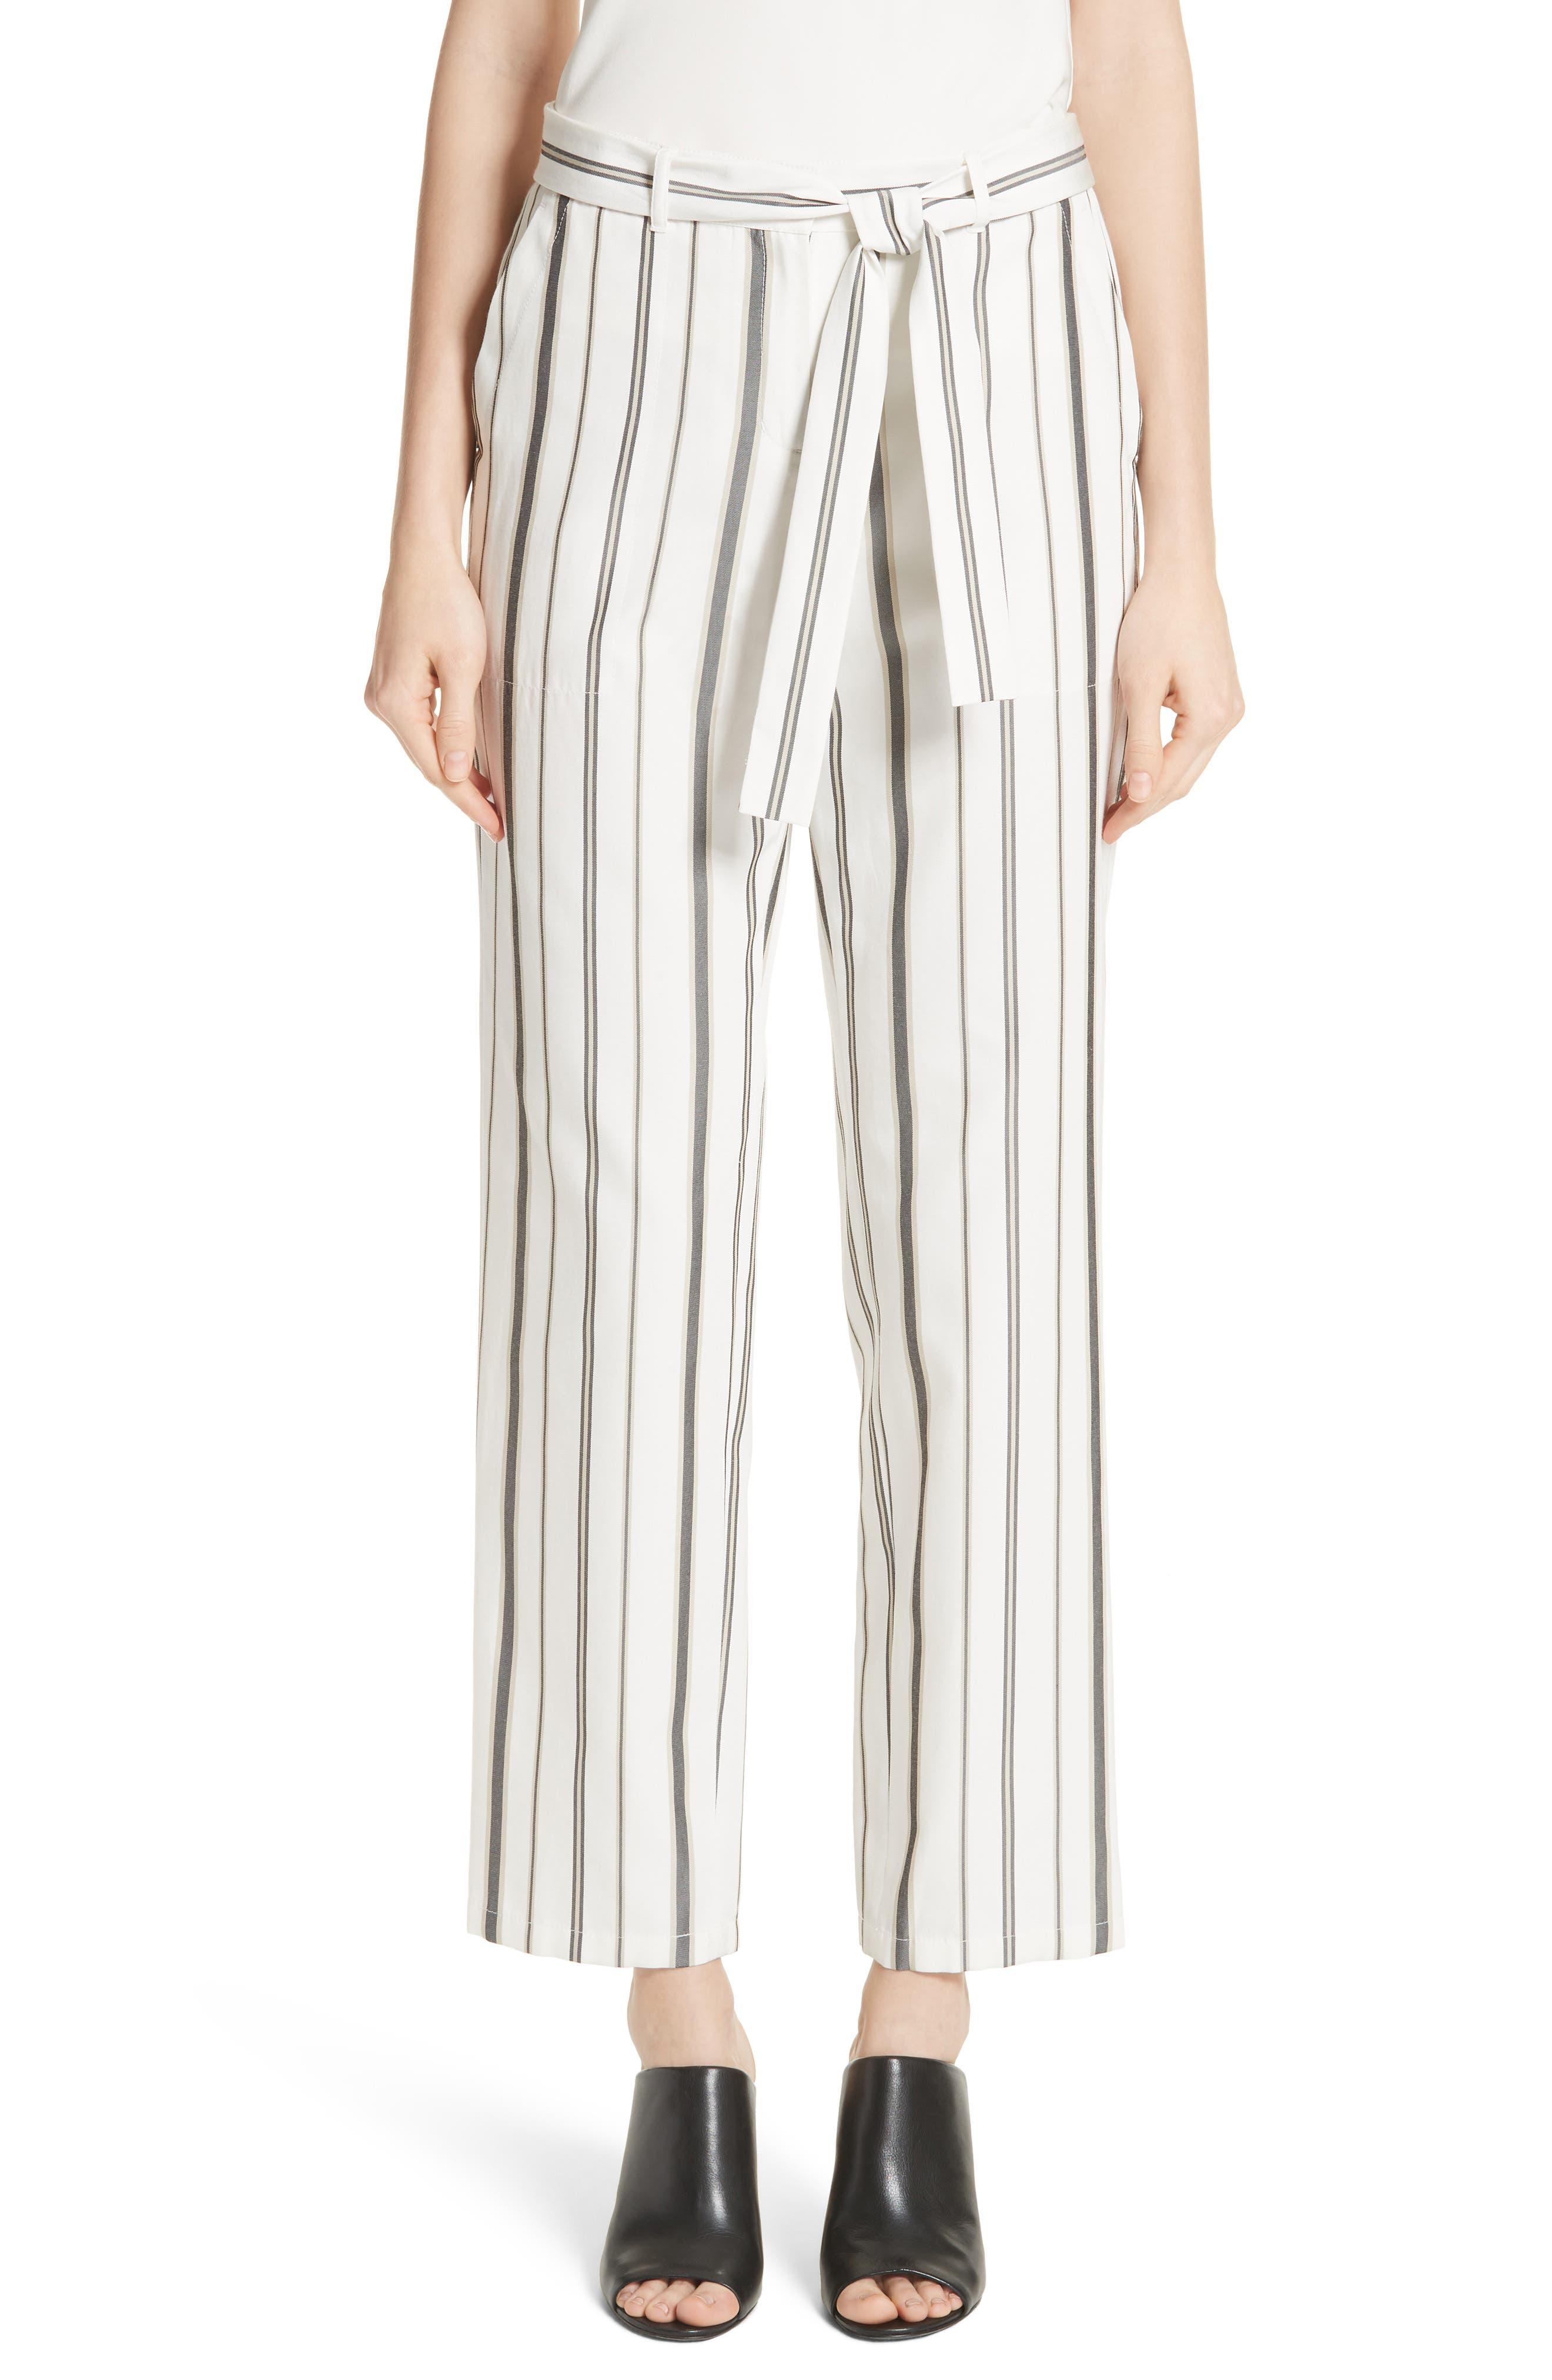 Fulton Gallant Stripe Pants,                             Main thumbnail 1, color,                             CLOUD MULTI